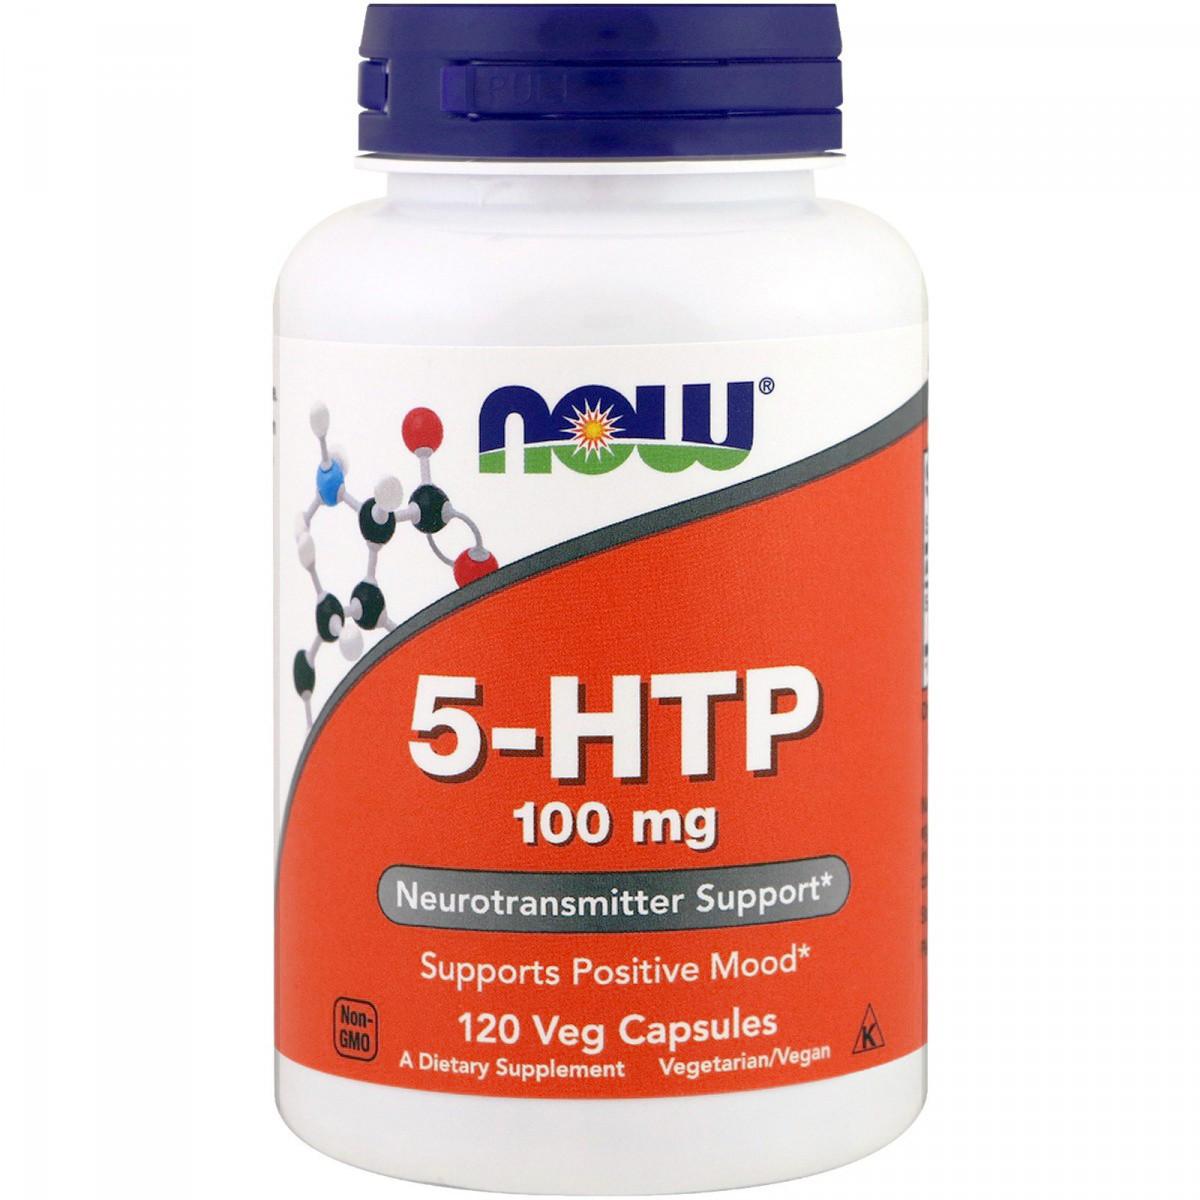 5-HTP (Гидрокситриптофан) 100мг, Now Foods, 120 вегетарианских капсул